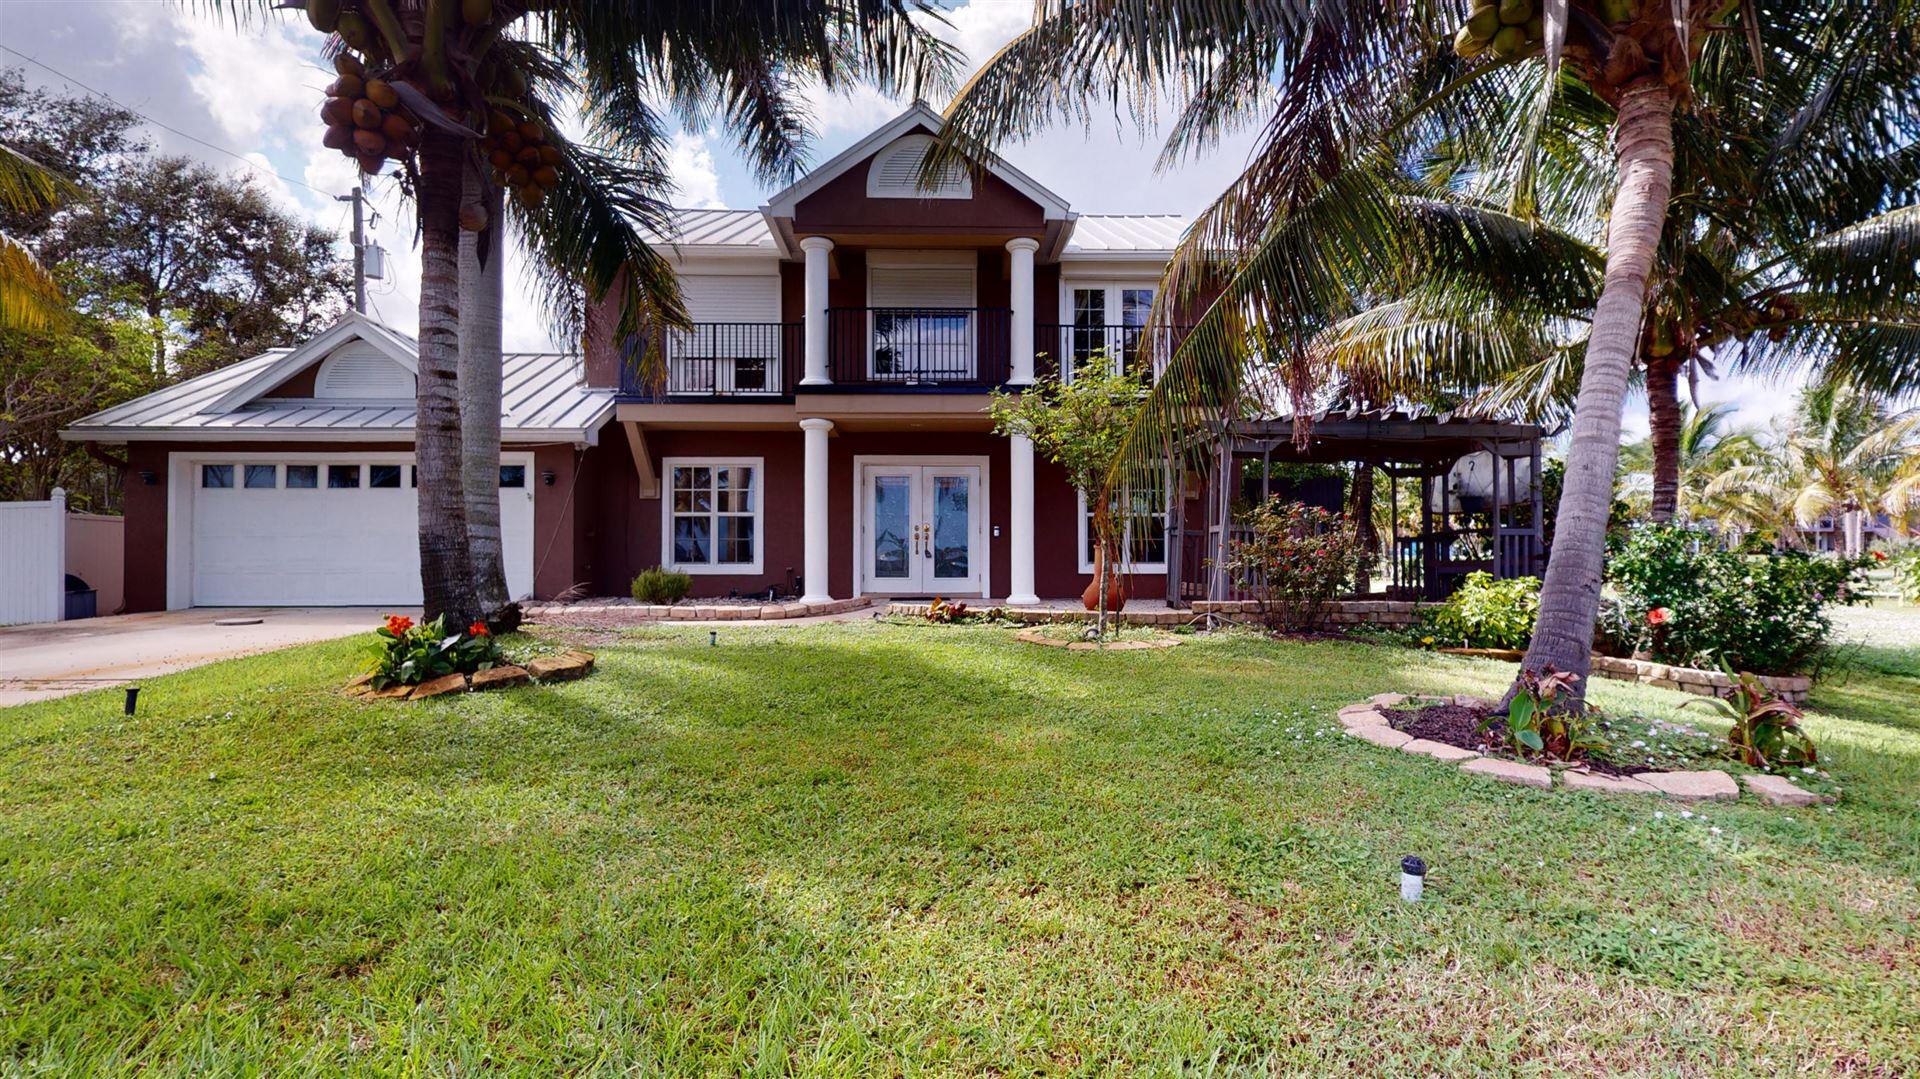 13209 S Indian River Drive, Jensen Beach, FL 34957 - #: RX-10647056